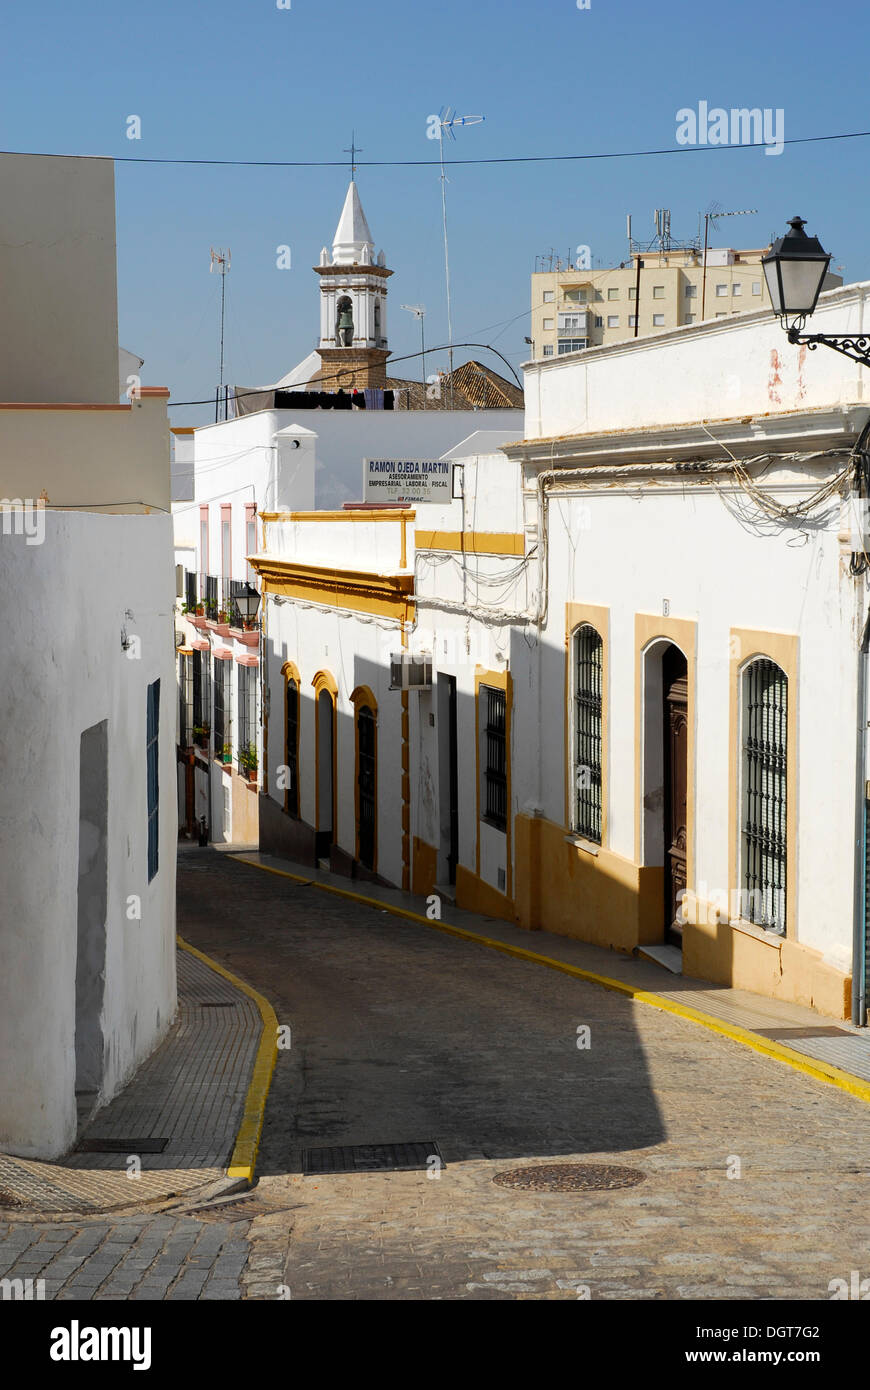 Street in the city centre of Ayamonte, Costa de la Luz, Huelva region, Andalusia, Spain, Europe - Stock Image